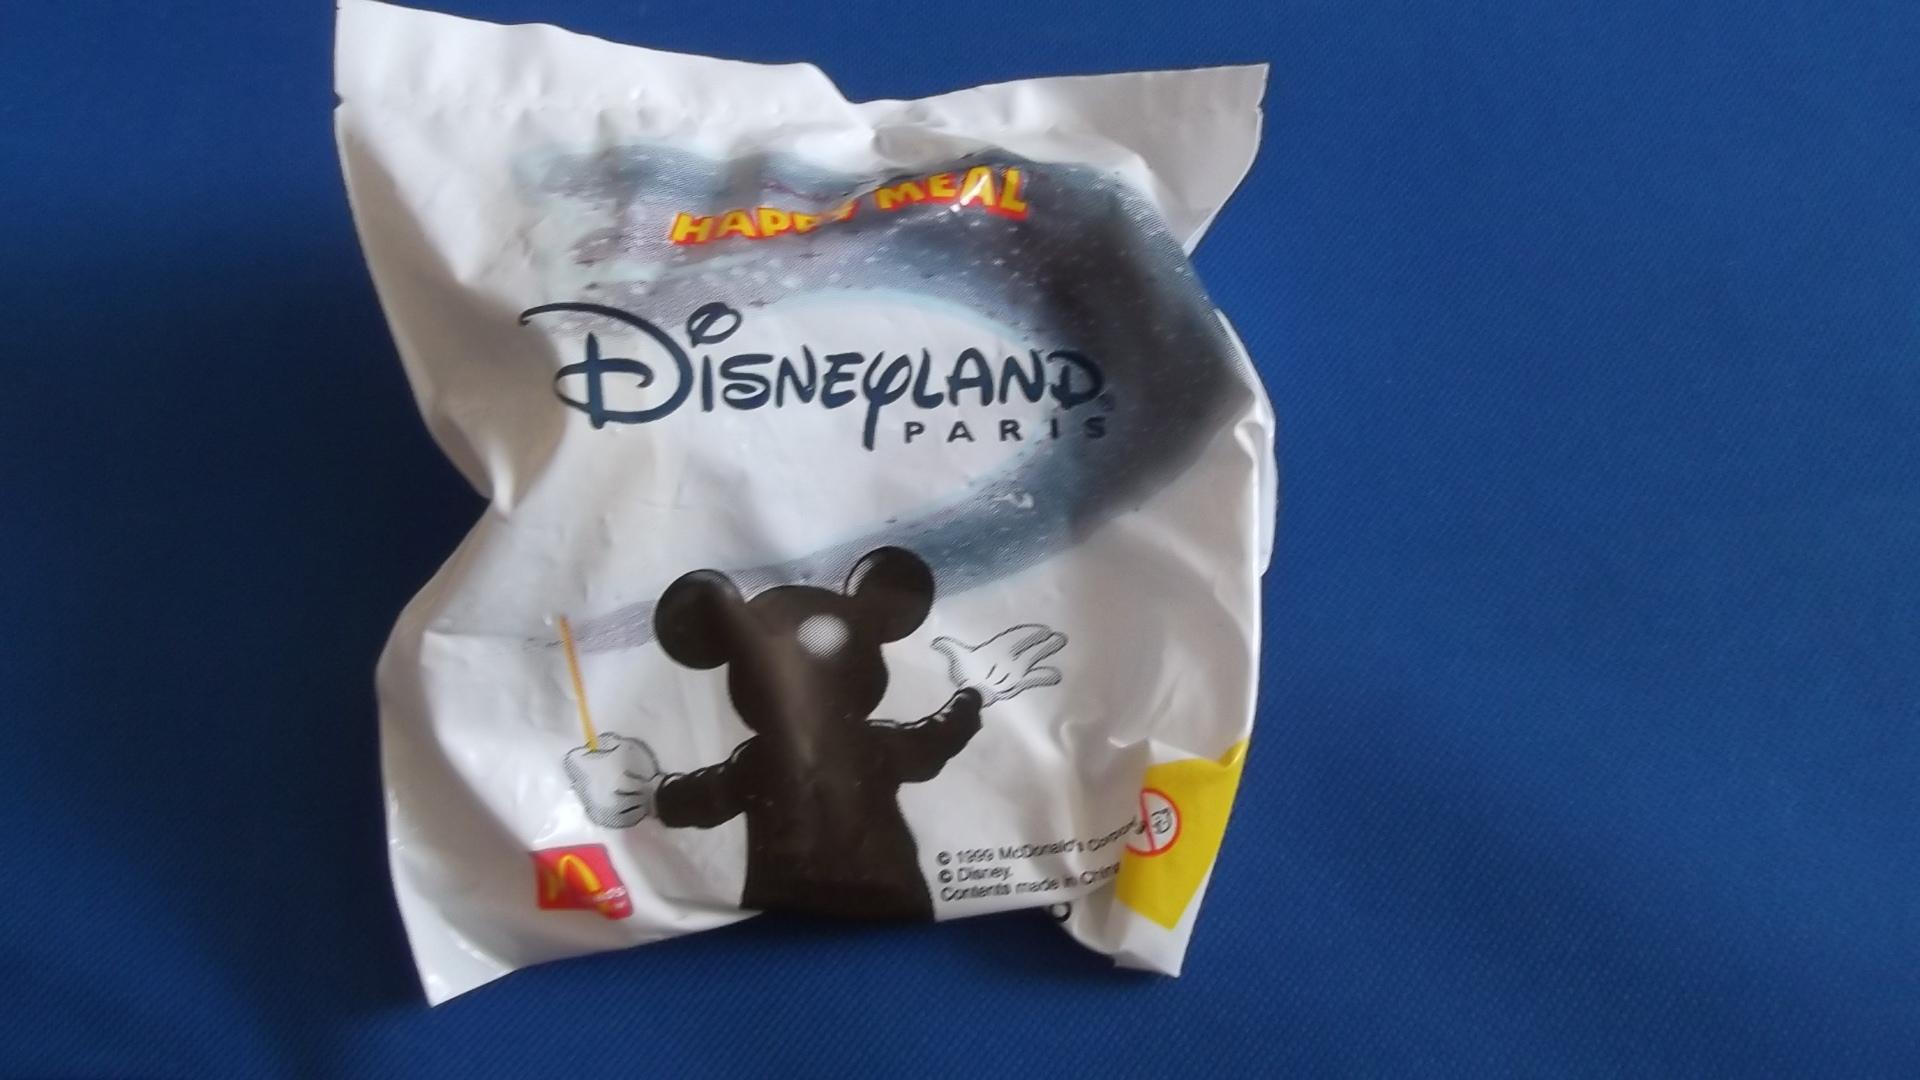 McDonalds Disneyland Paris Train #16 Toy From 1999 New